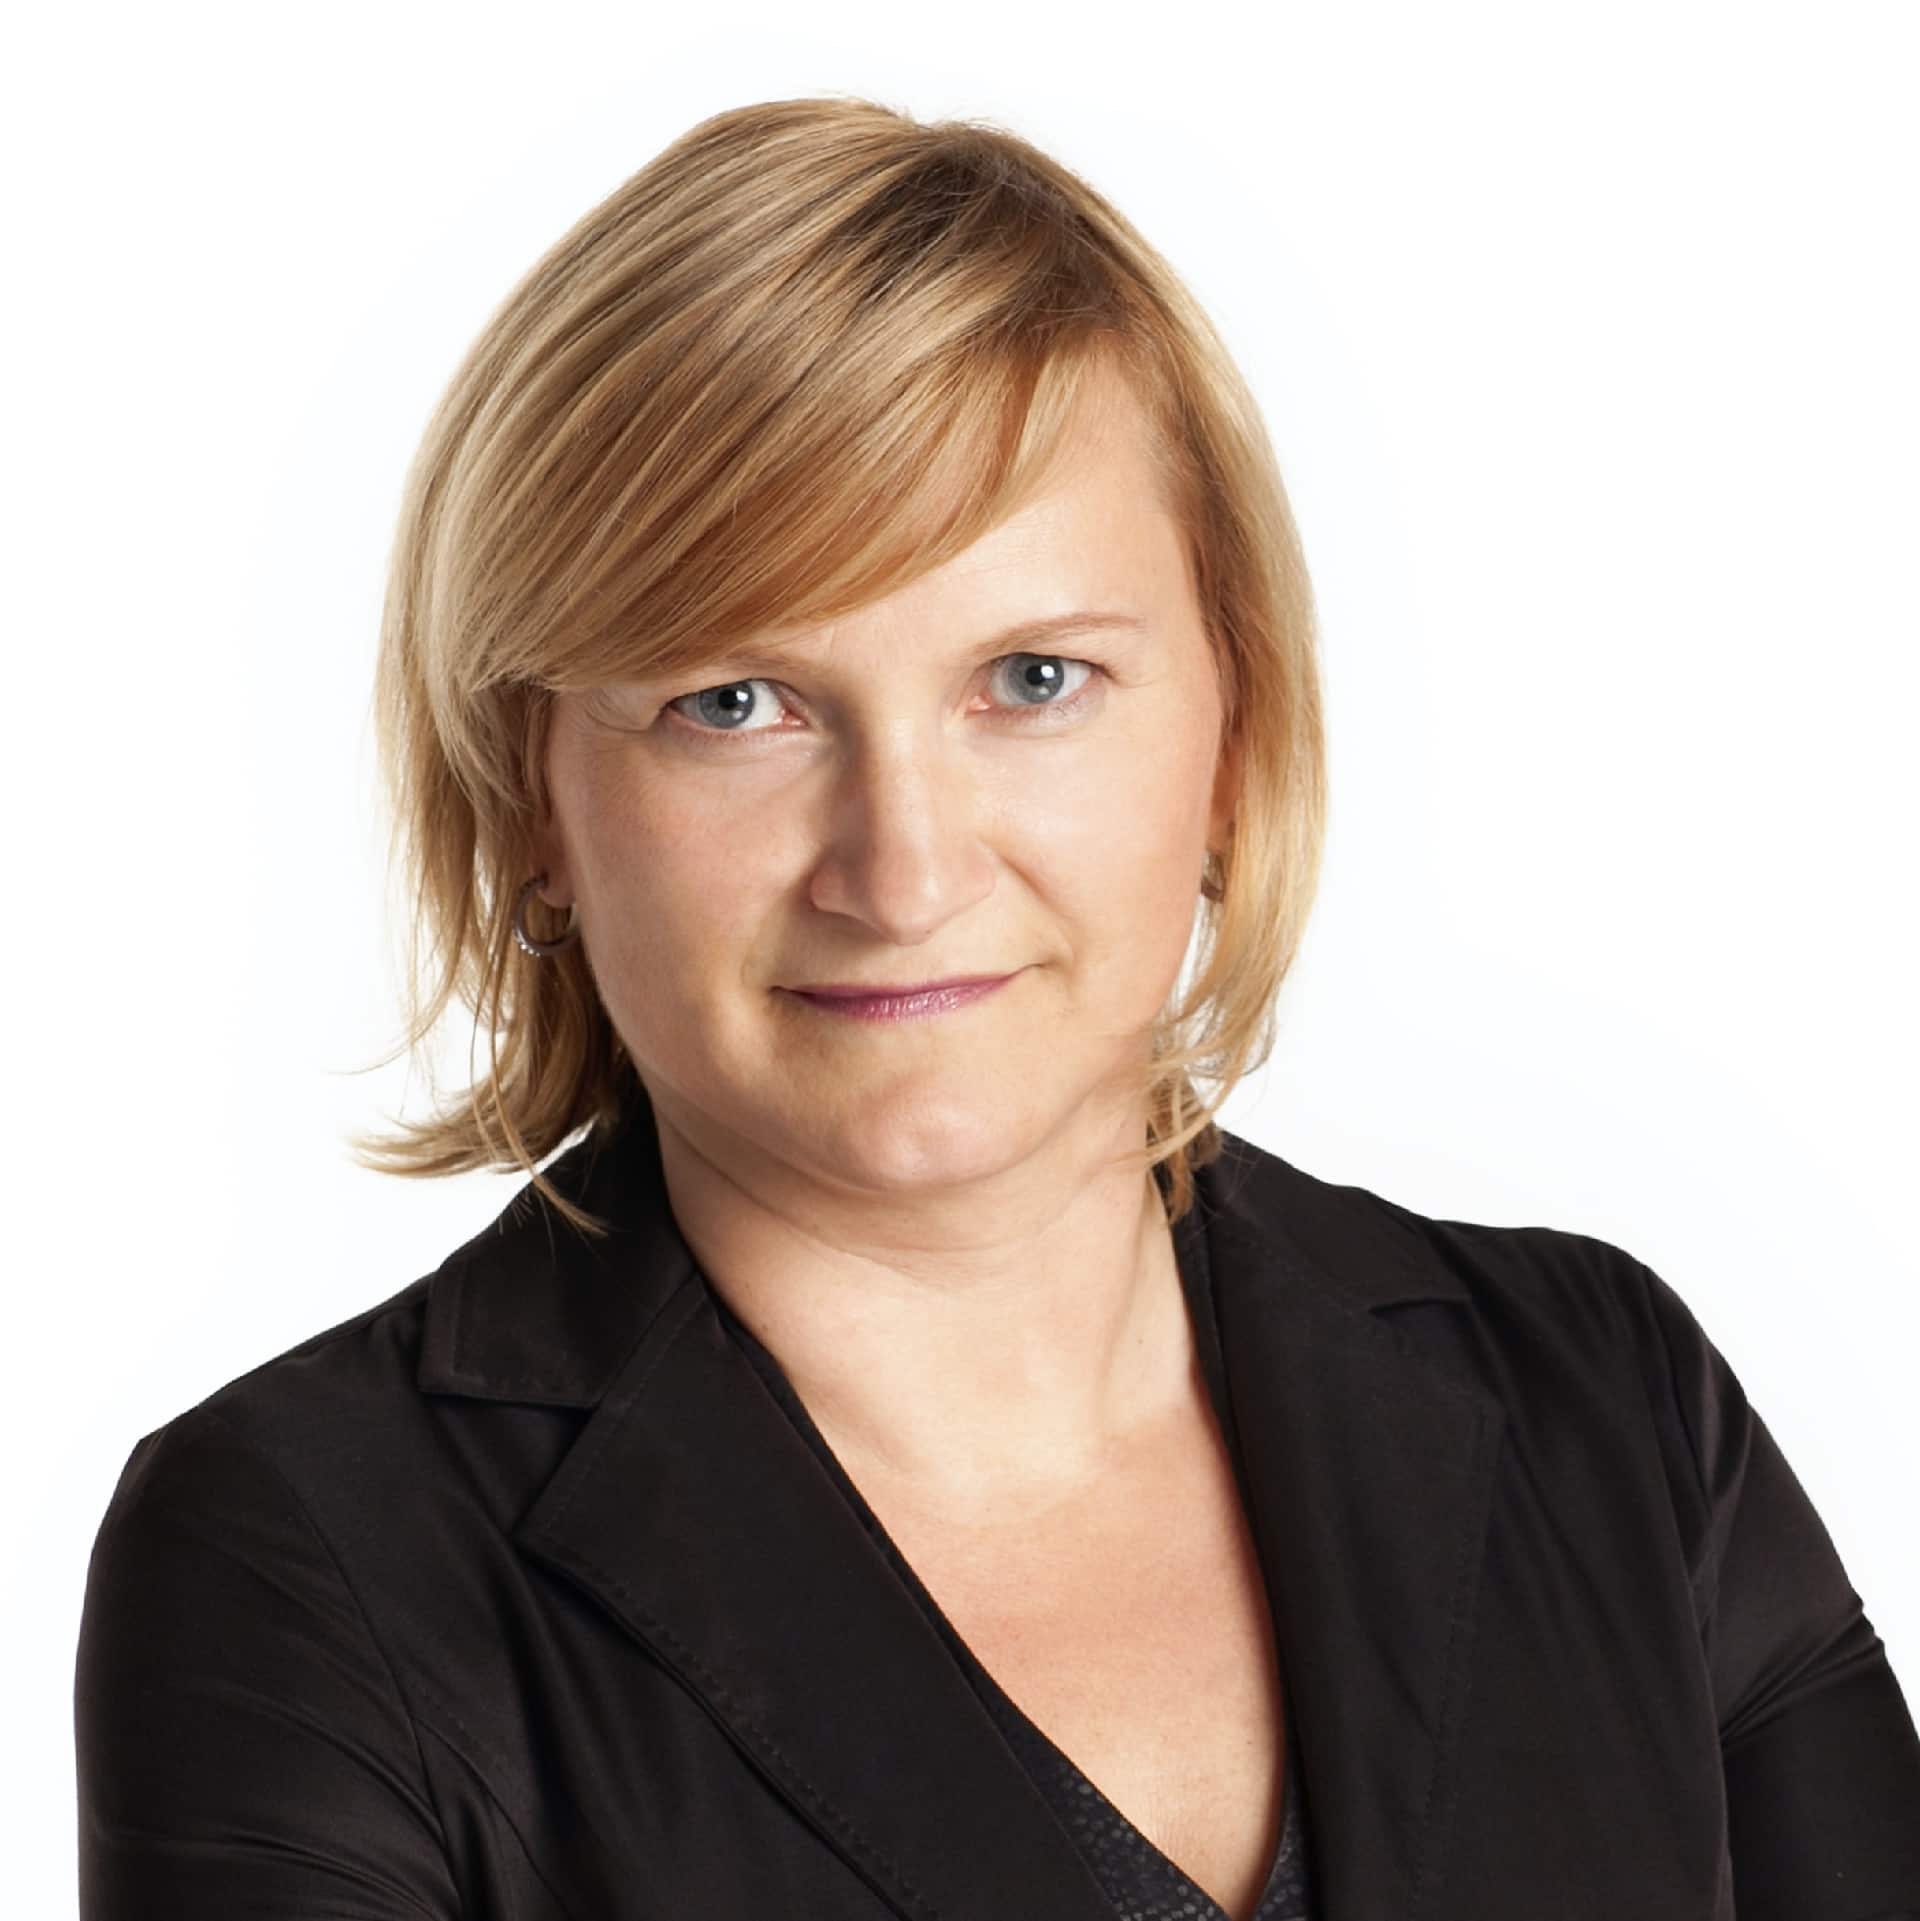 Aneta Ogrodniczekeasyshare